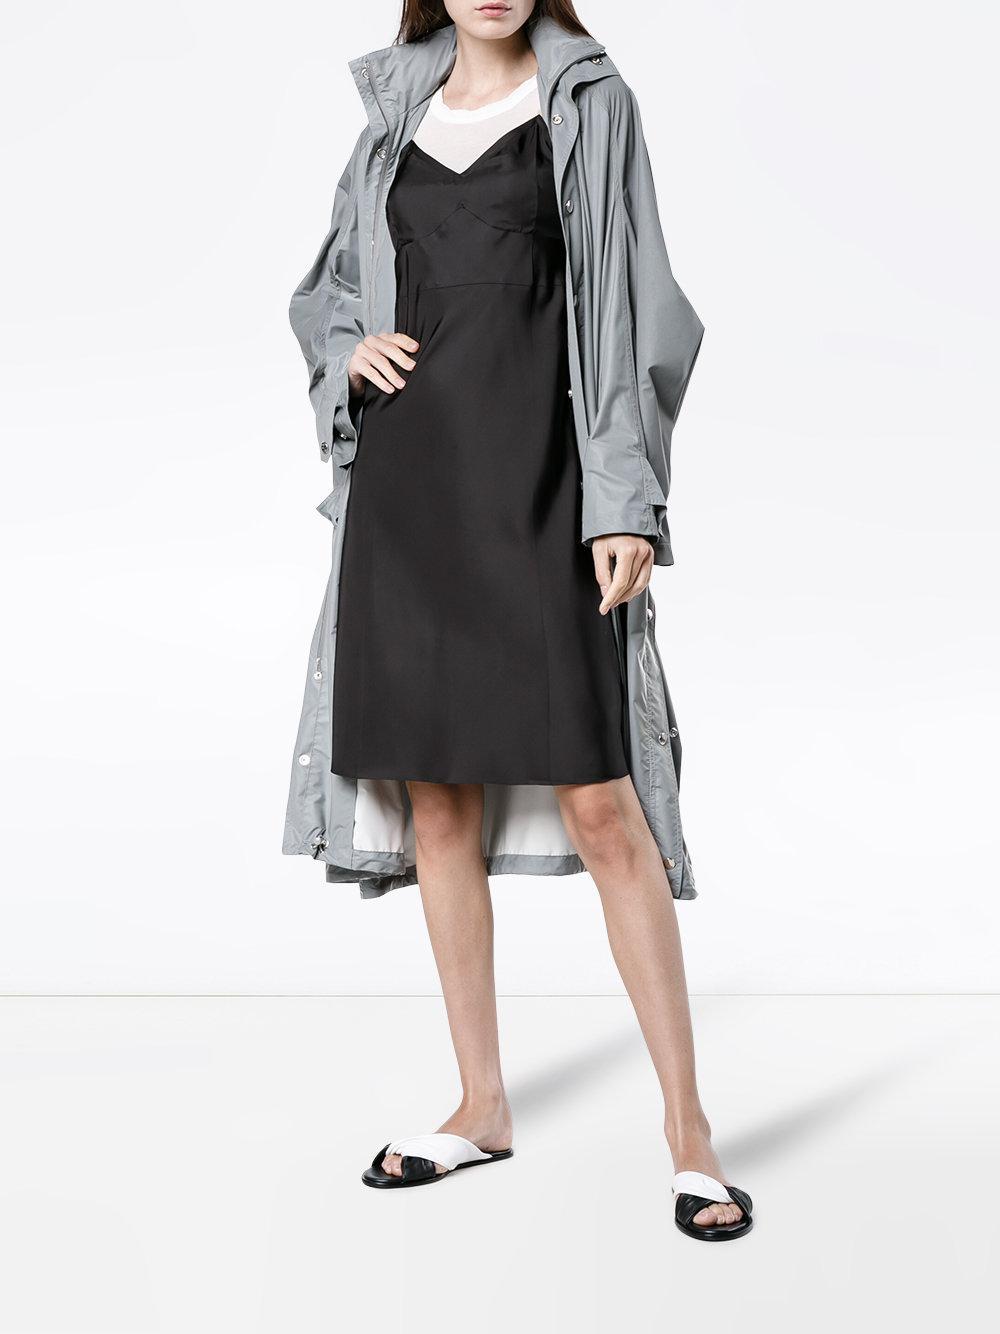 5e4b5f060ac97 Helmut Lang - Black Matte Slip Dress - Lyst. View fullscreen